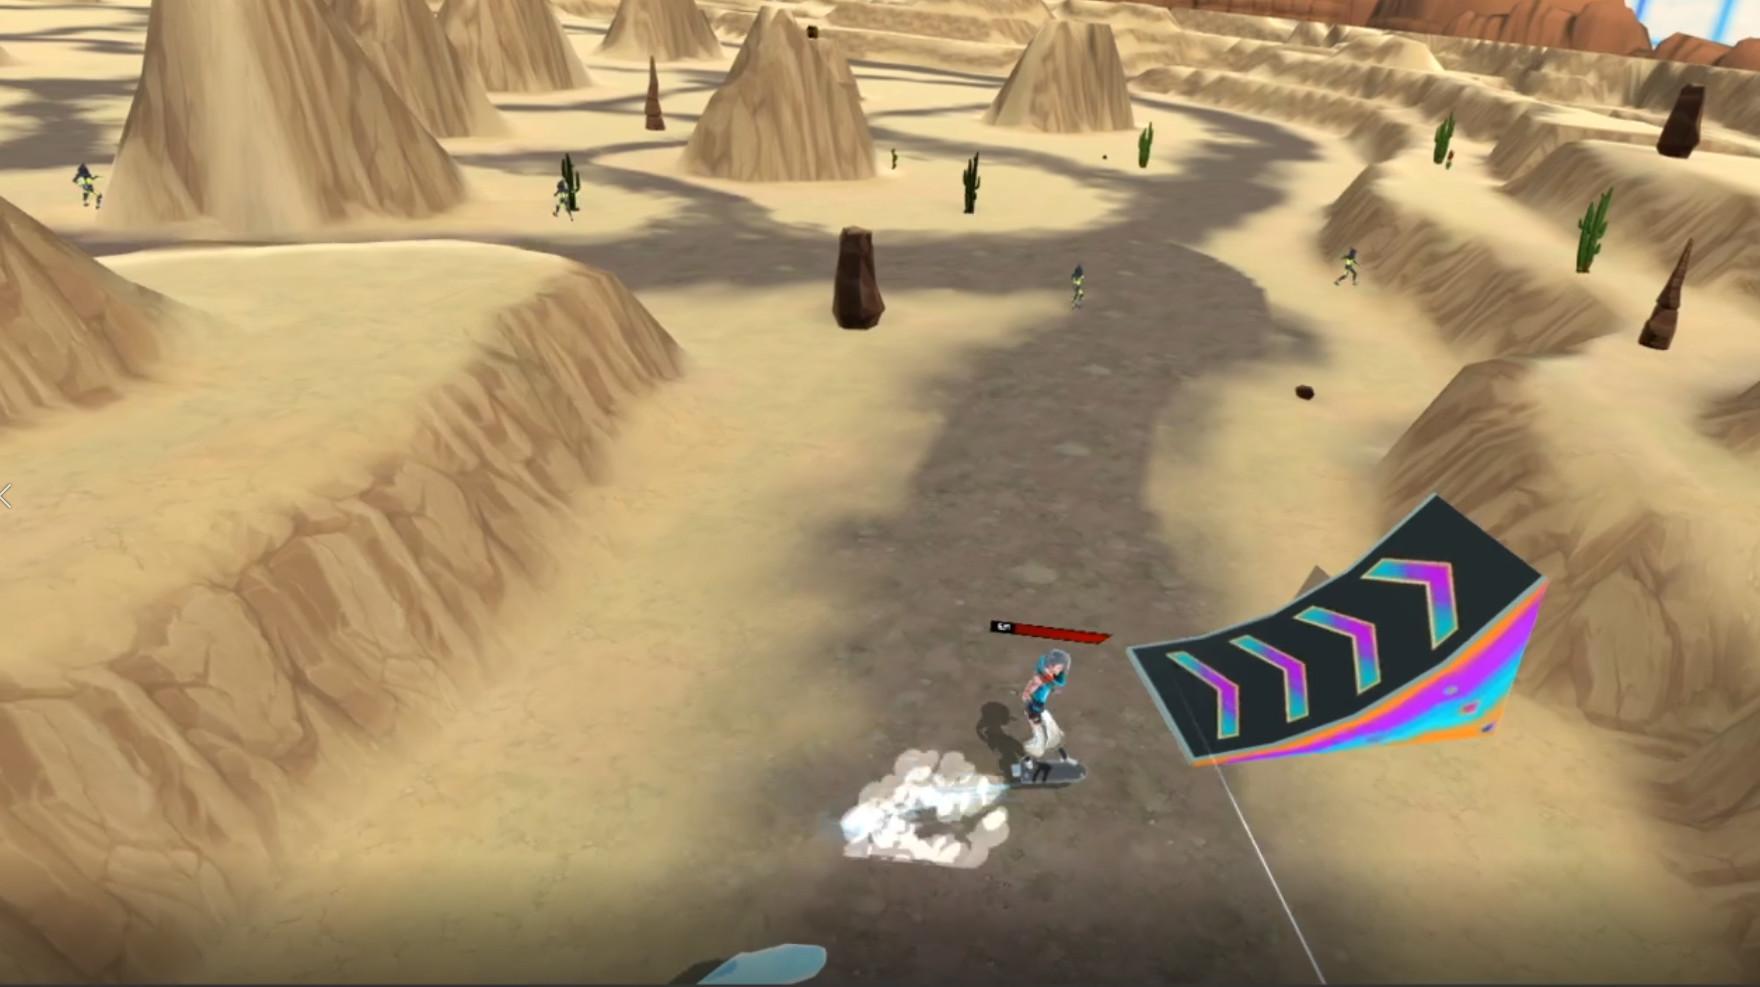 Oculus Quest 游戏《Arcaxer VR RPG游戏》奥术黑客插图(3)